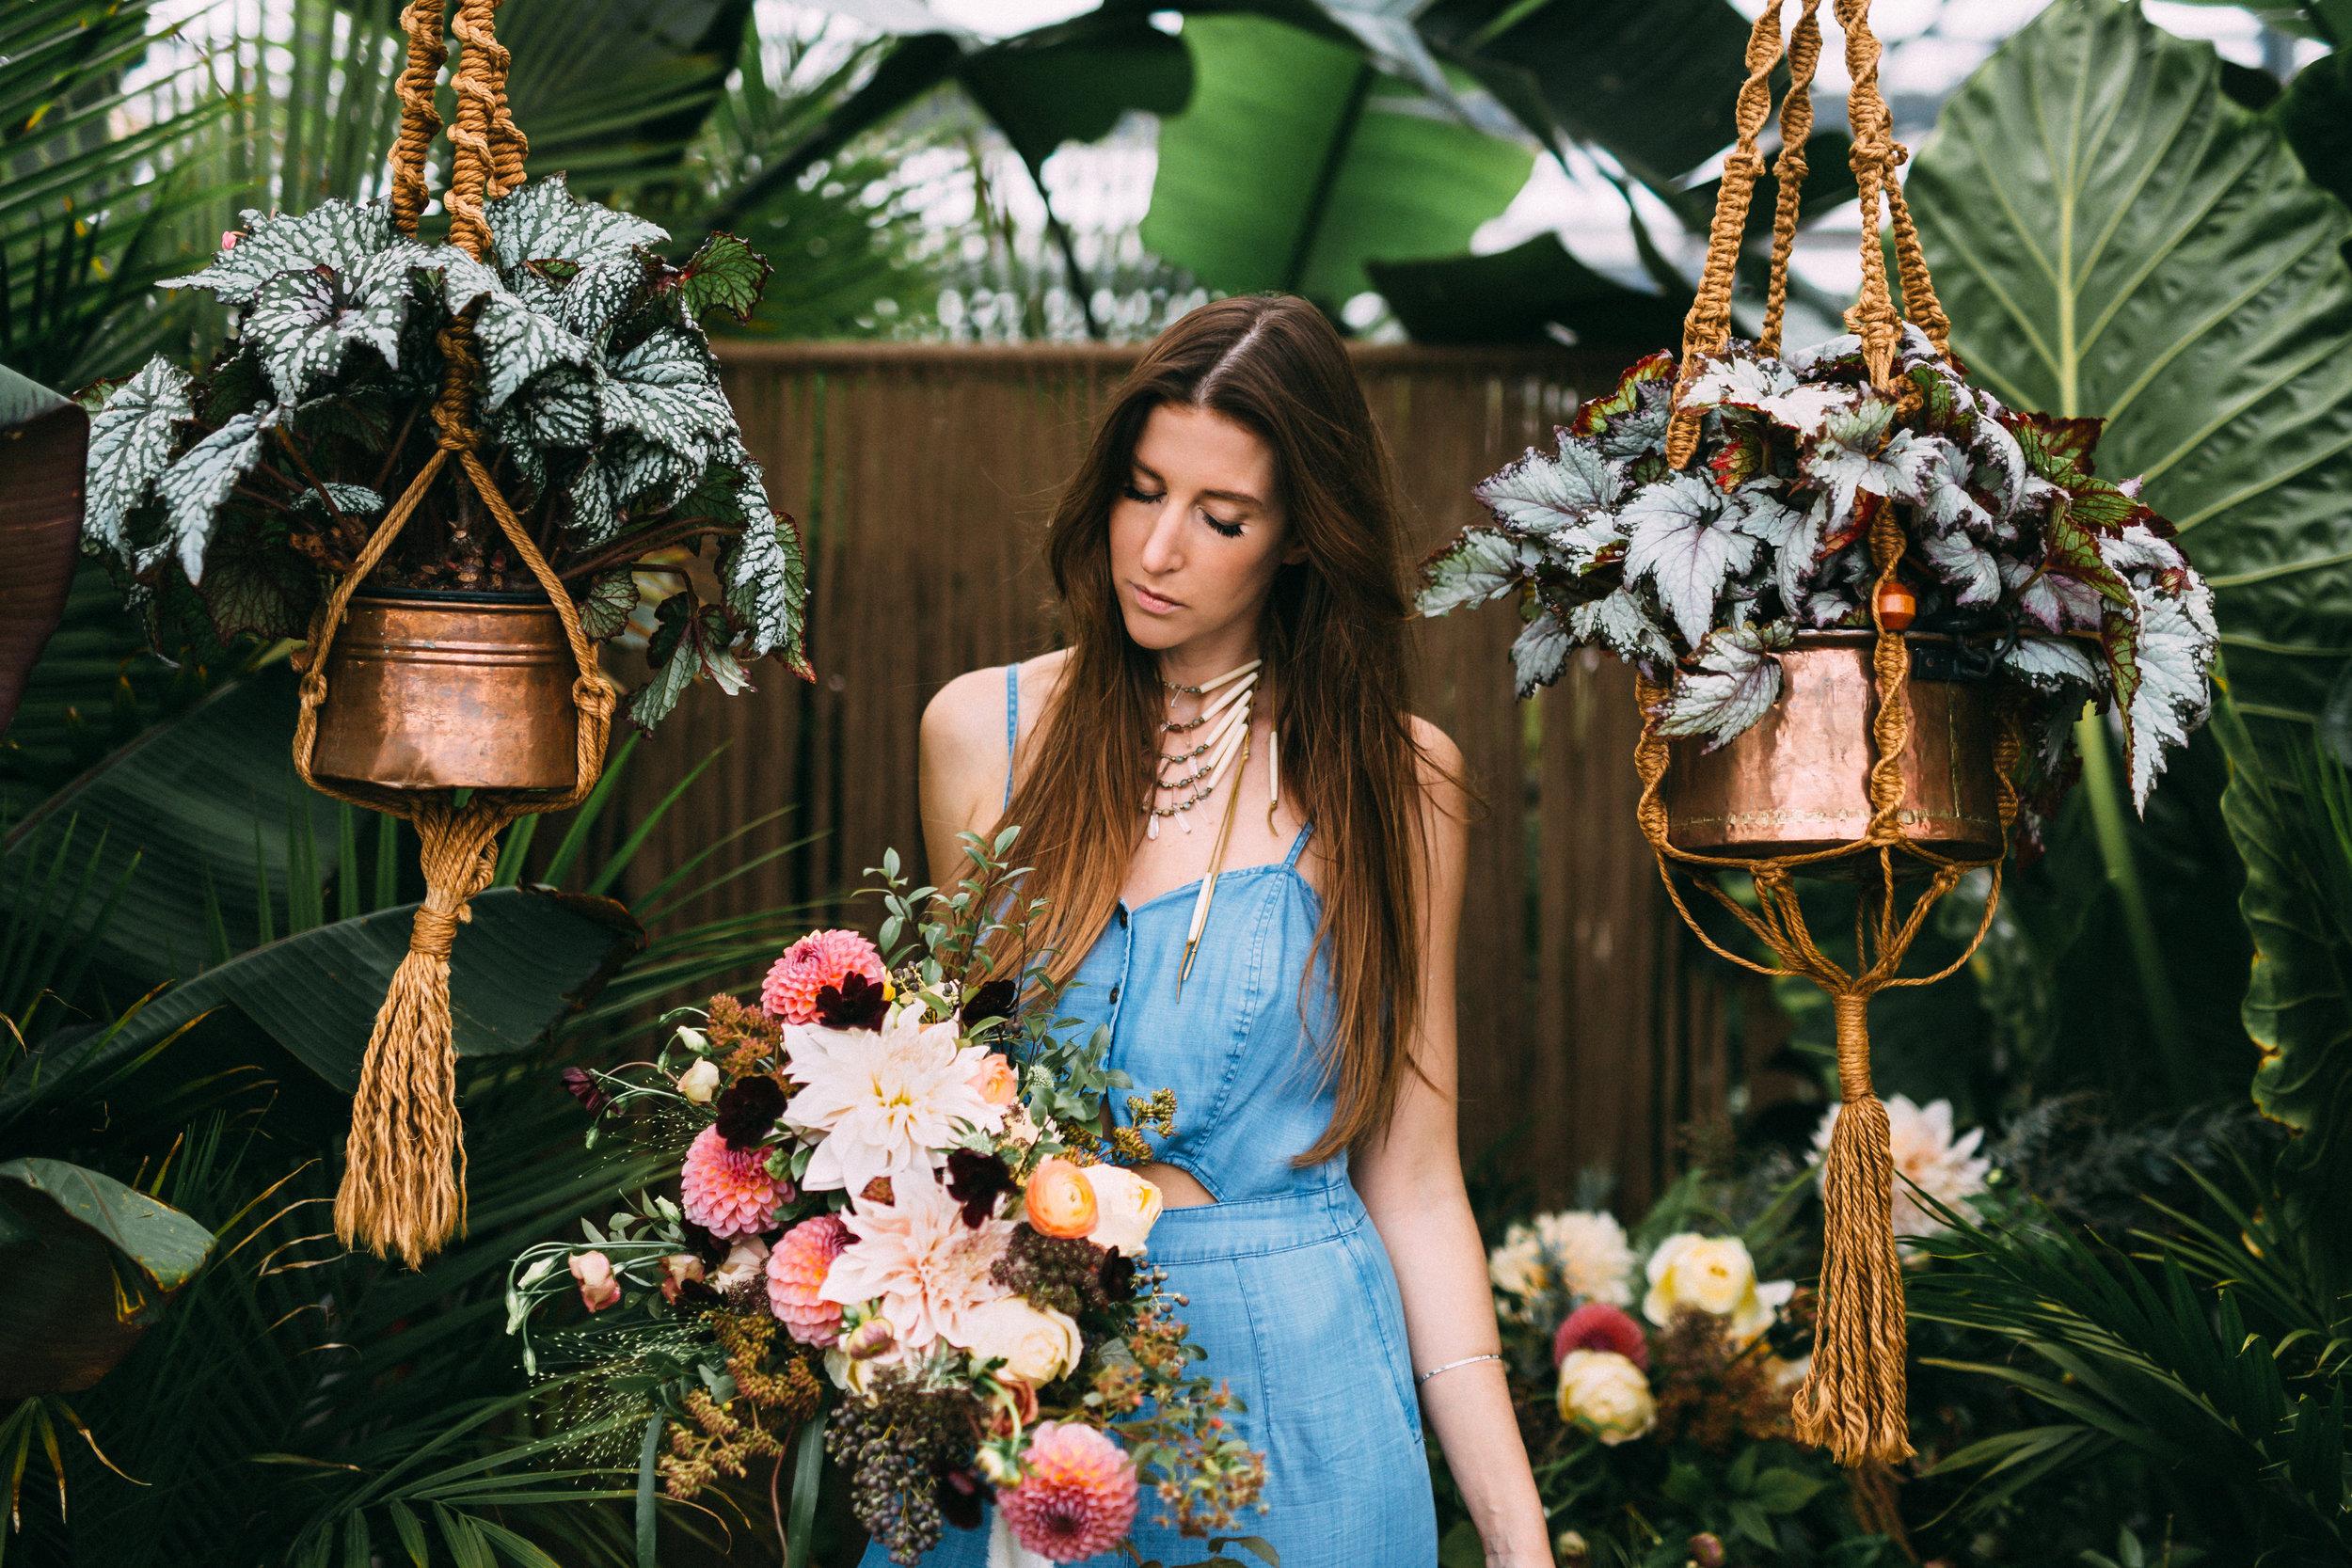 amanda cowley events niagara wedding planner free spirit styling bohemian style macrame hanging planter